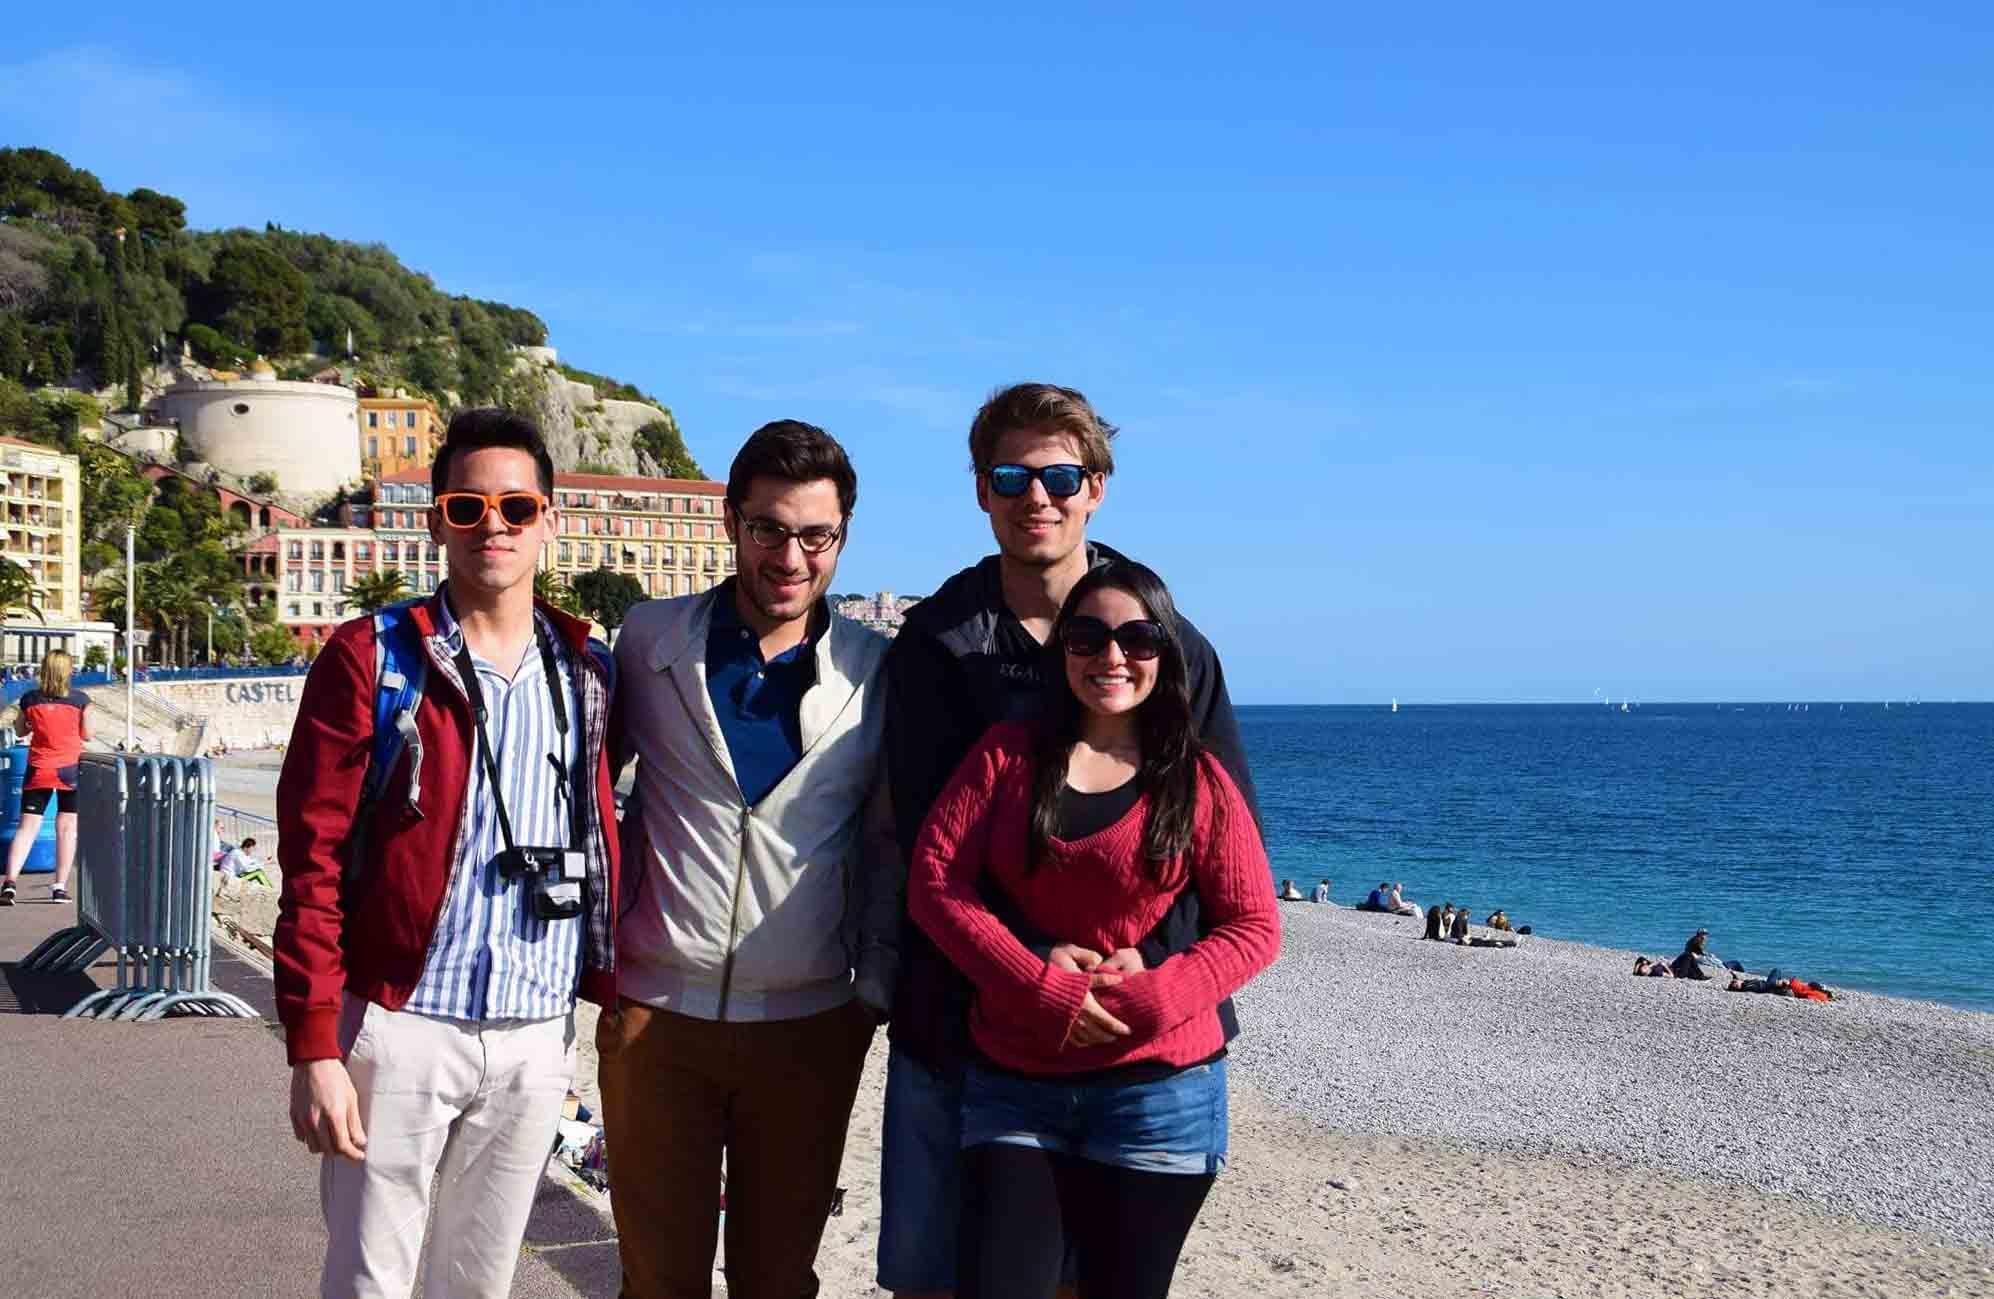 Reencuentros en la Côte d'Azur